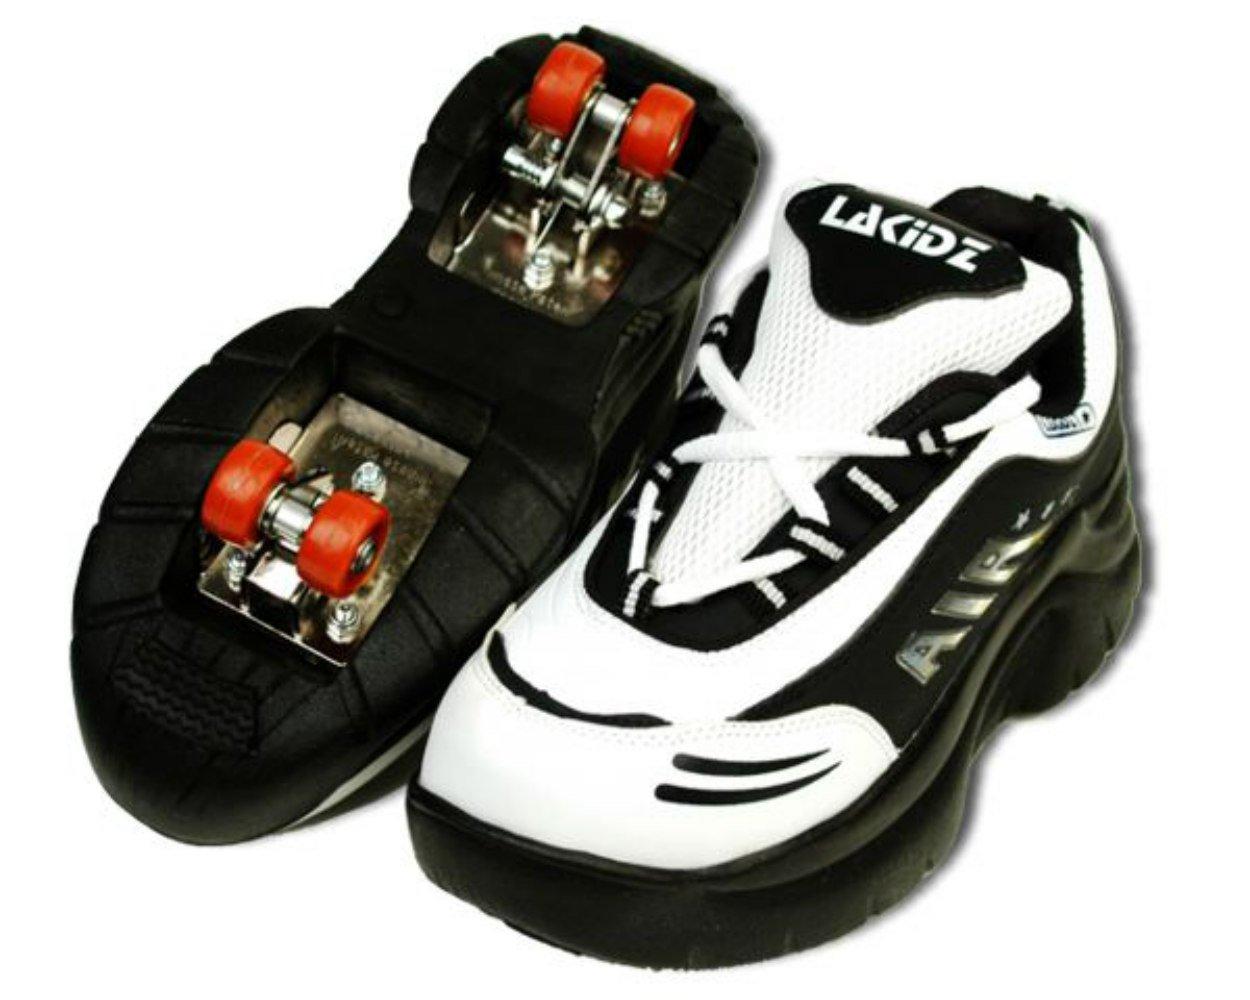 La Kidz Double Retractable Lined 4 Wheels Roller Skates Sneakers Shoes For Boy S Girl S Kid S Buy Online In Samoa At Samoa Desertcart Com Productid 75112048